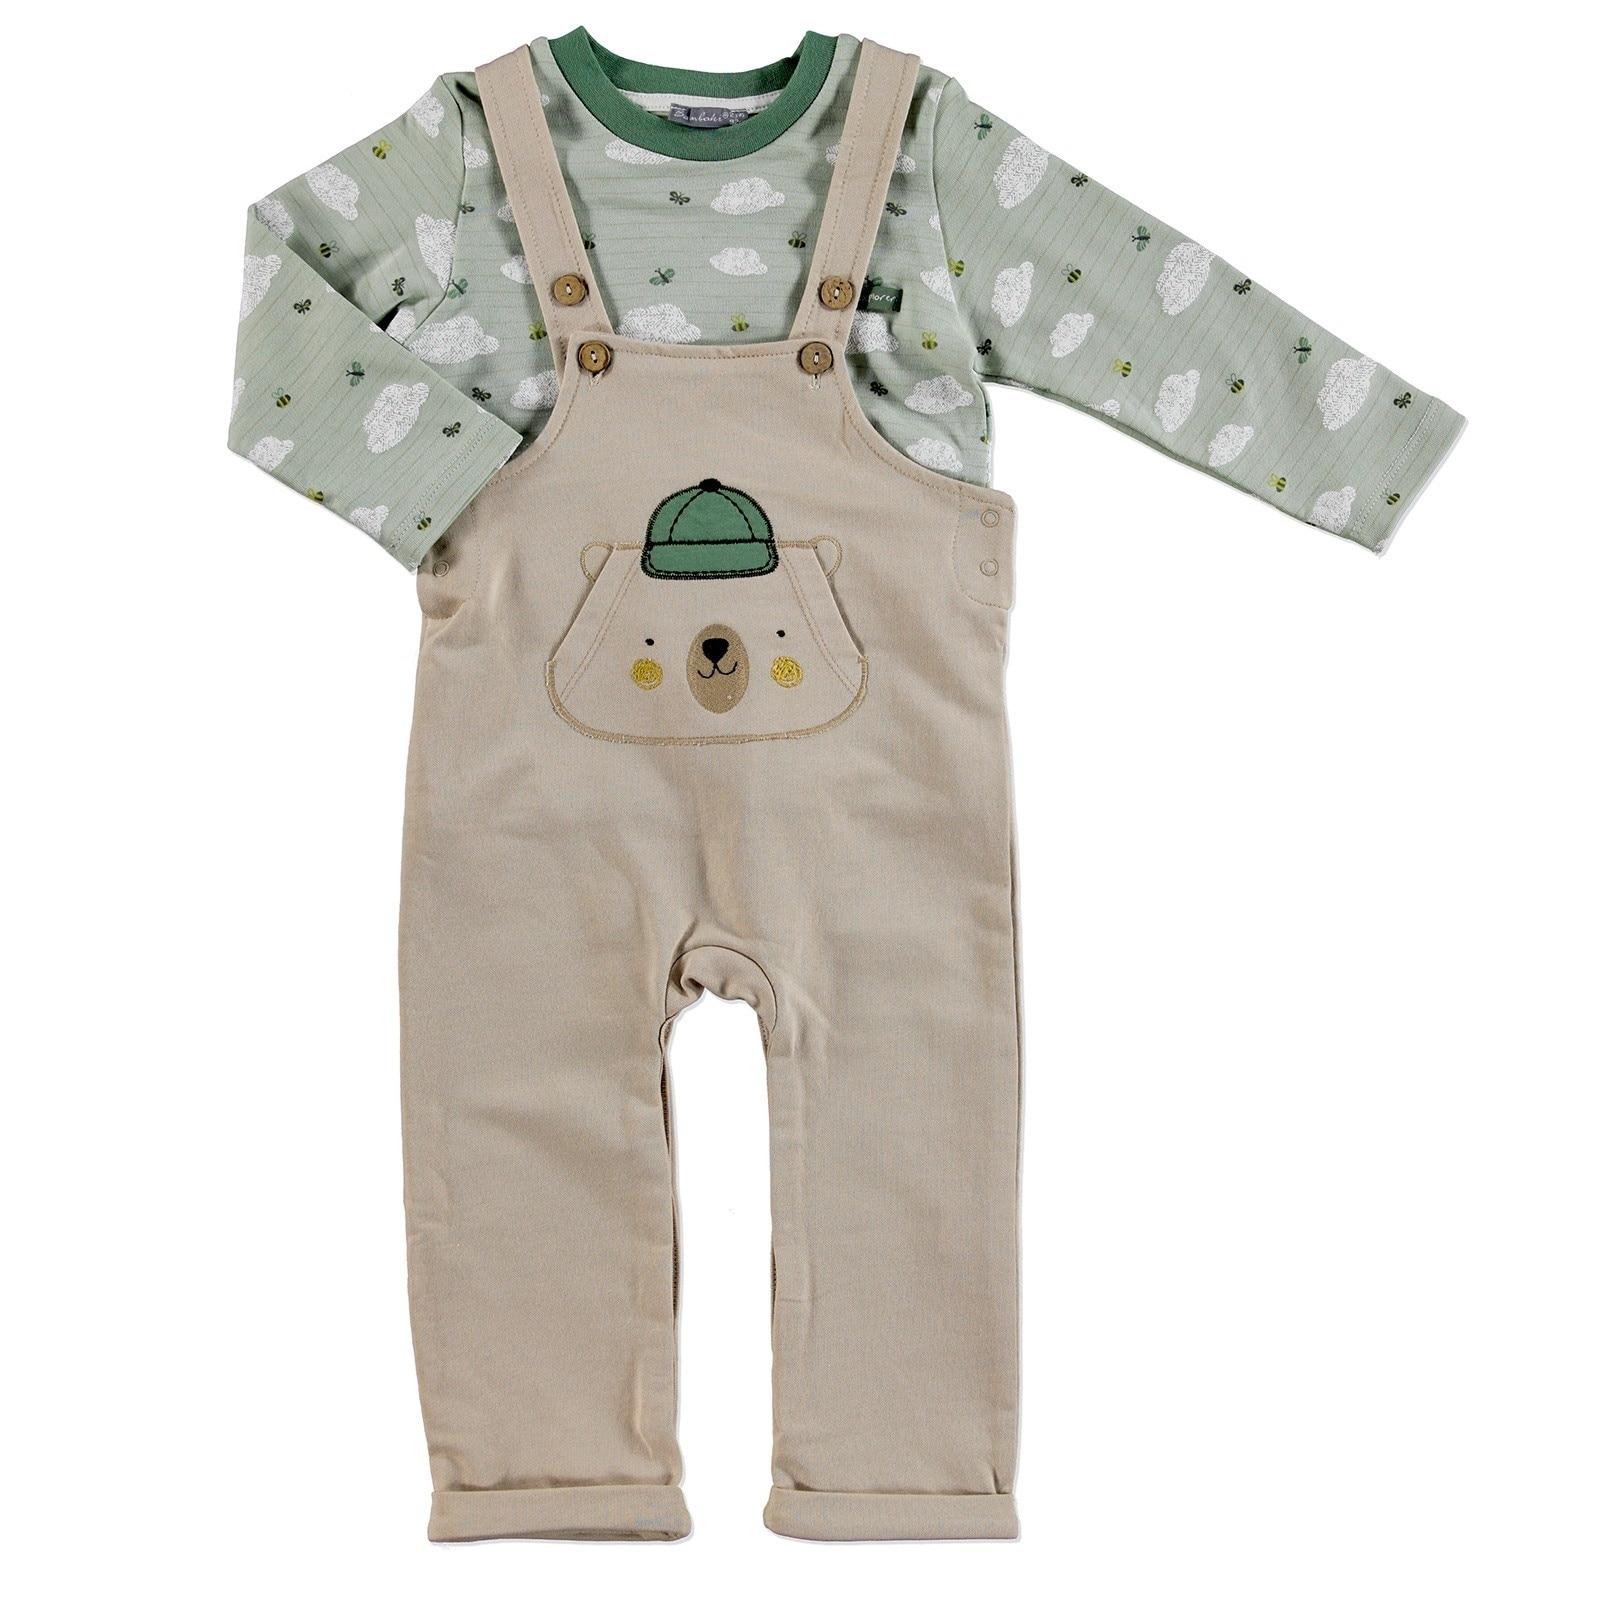 Ebebek Bambaki Scout Bear Baby Boy Dungarees Sweatshirt 2 Pcs Set